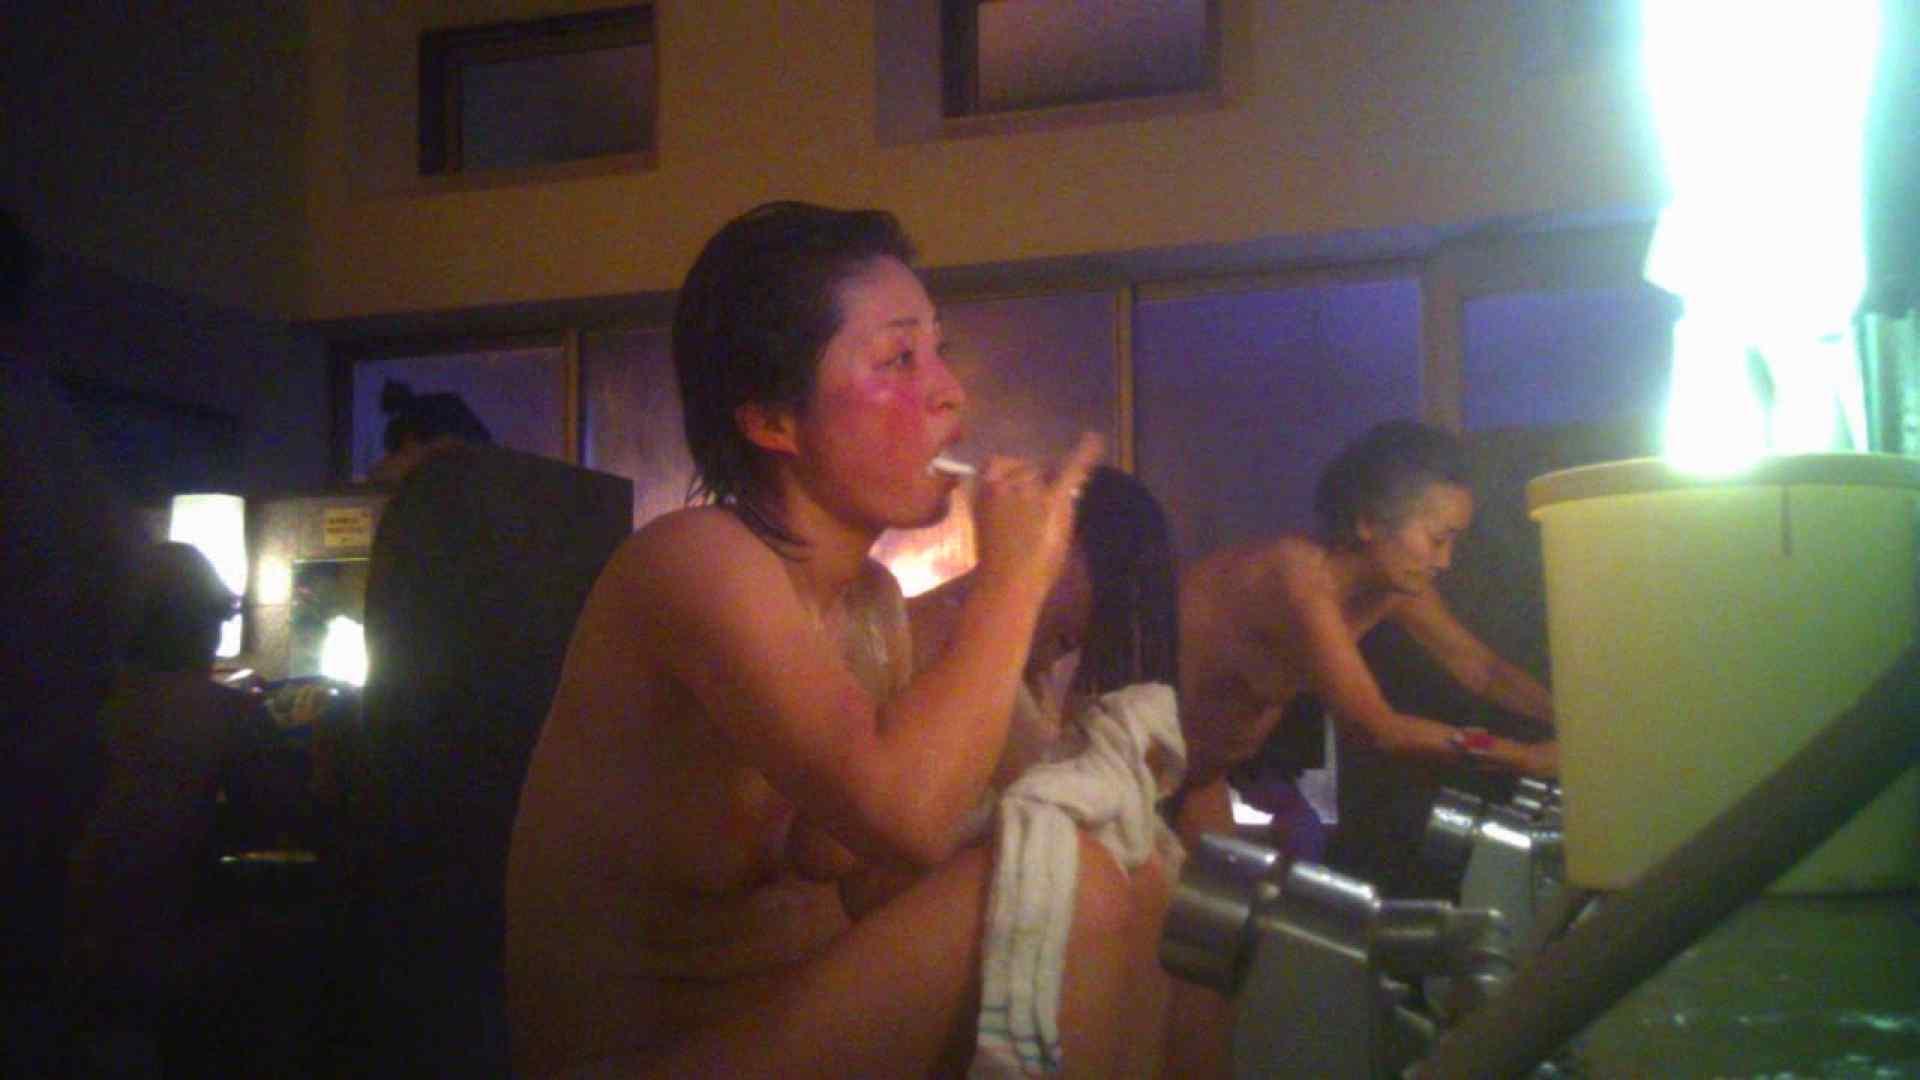 TG.21 【上等兵】井戸端会議が大好きな奥さん 女風呂 | 女湯  69画像 11